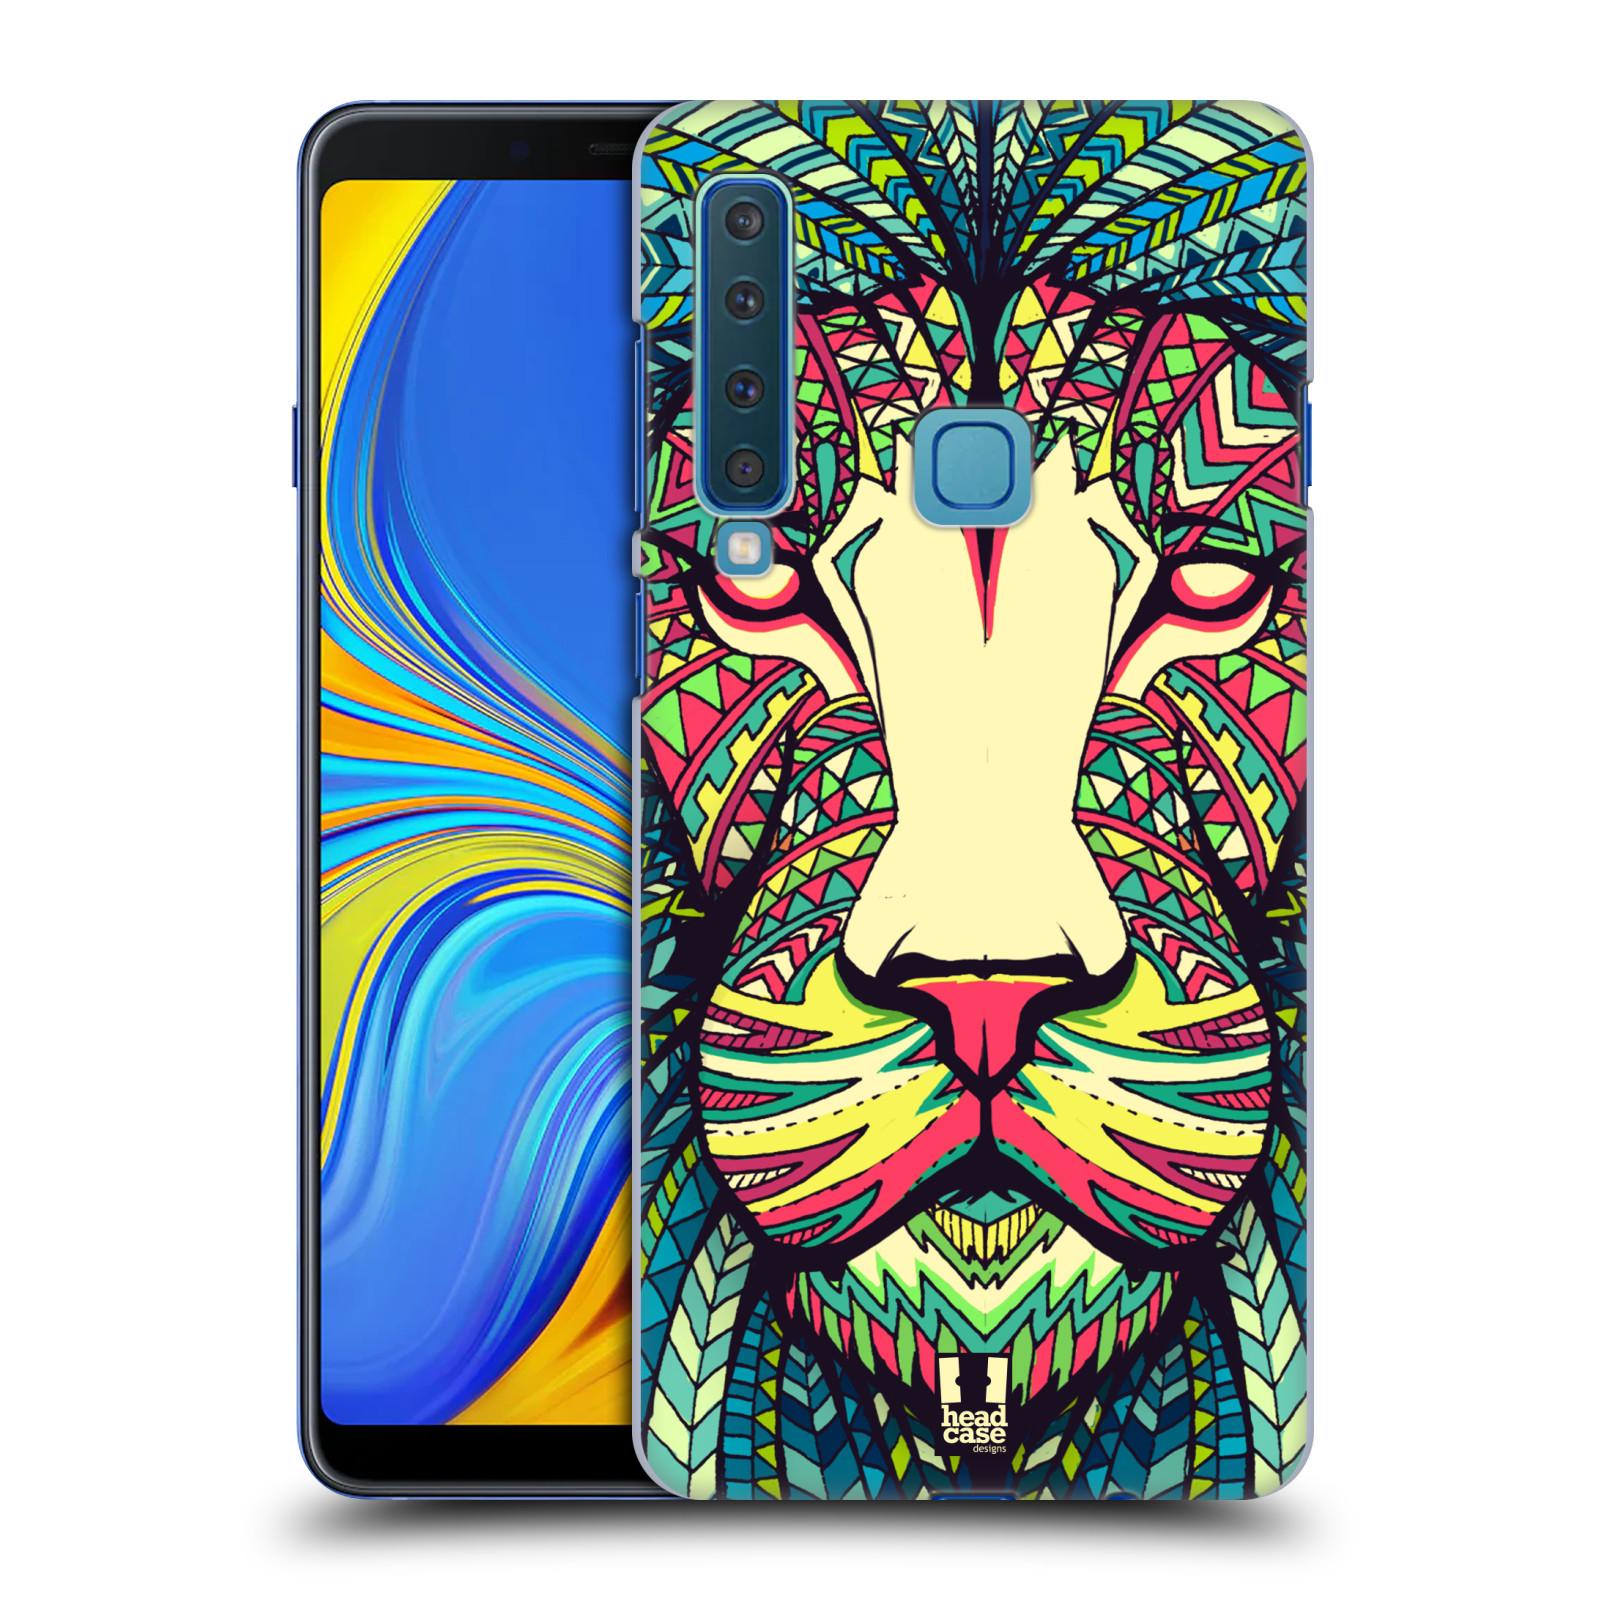 Plastové pouzdro na mobil Samsung Galaxy A9 (2018) - Head Case - AZTEC LEV